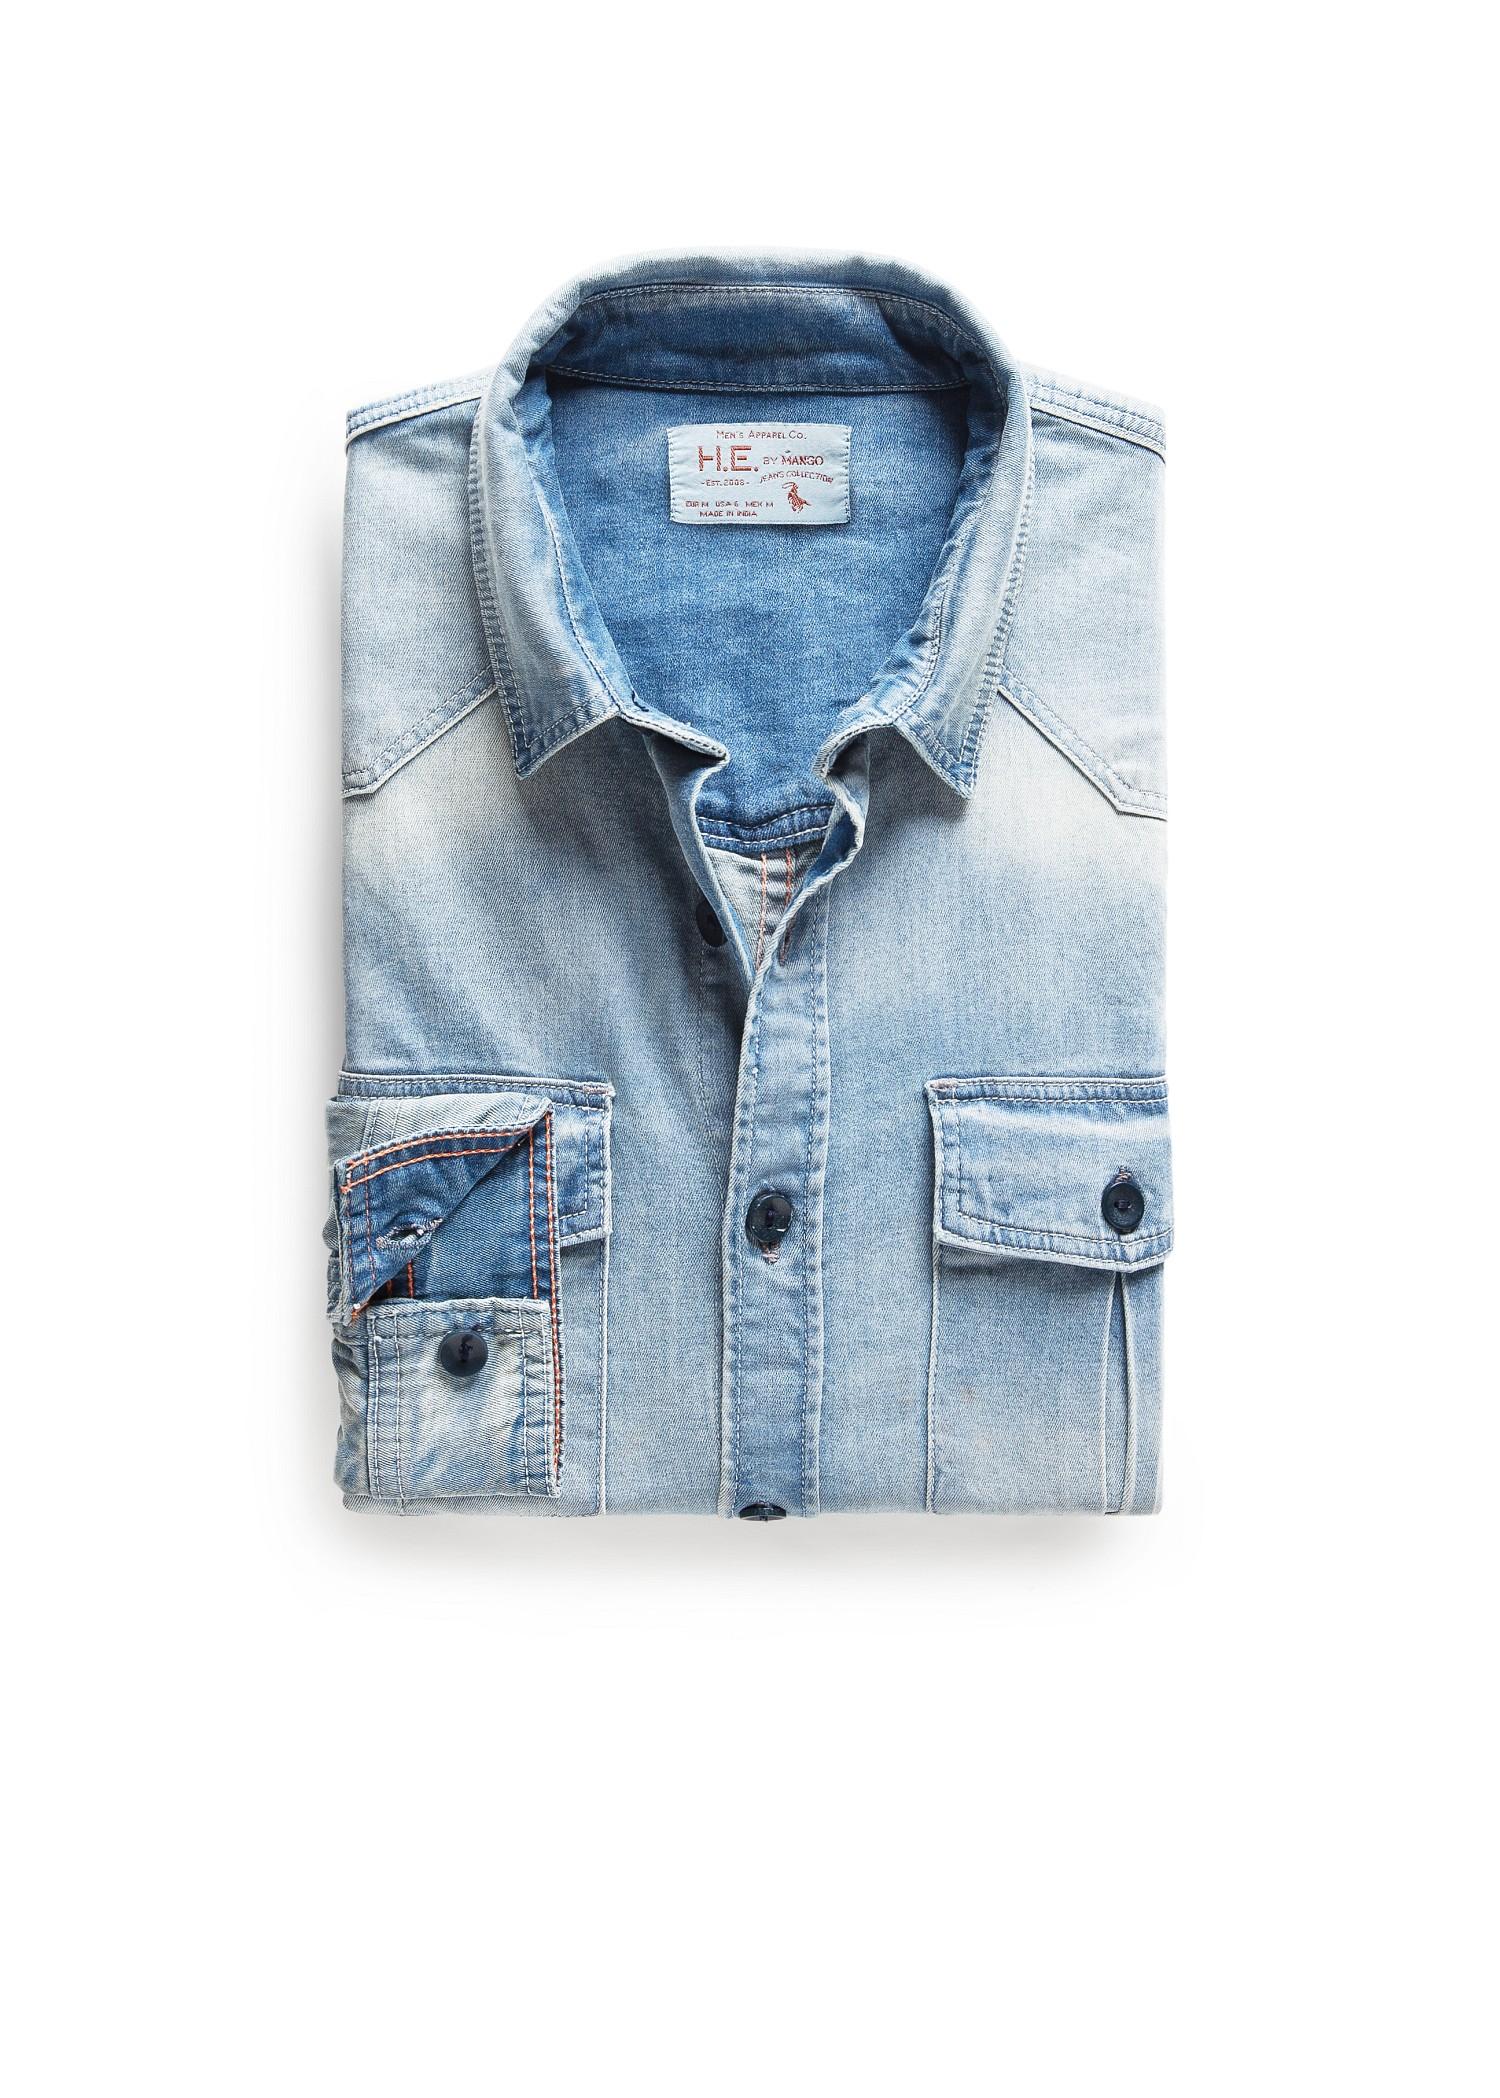 Mango Classicfit Light Denim Shirt In Blue For Men Lyst